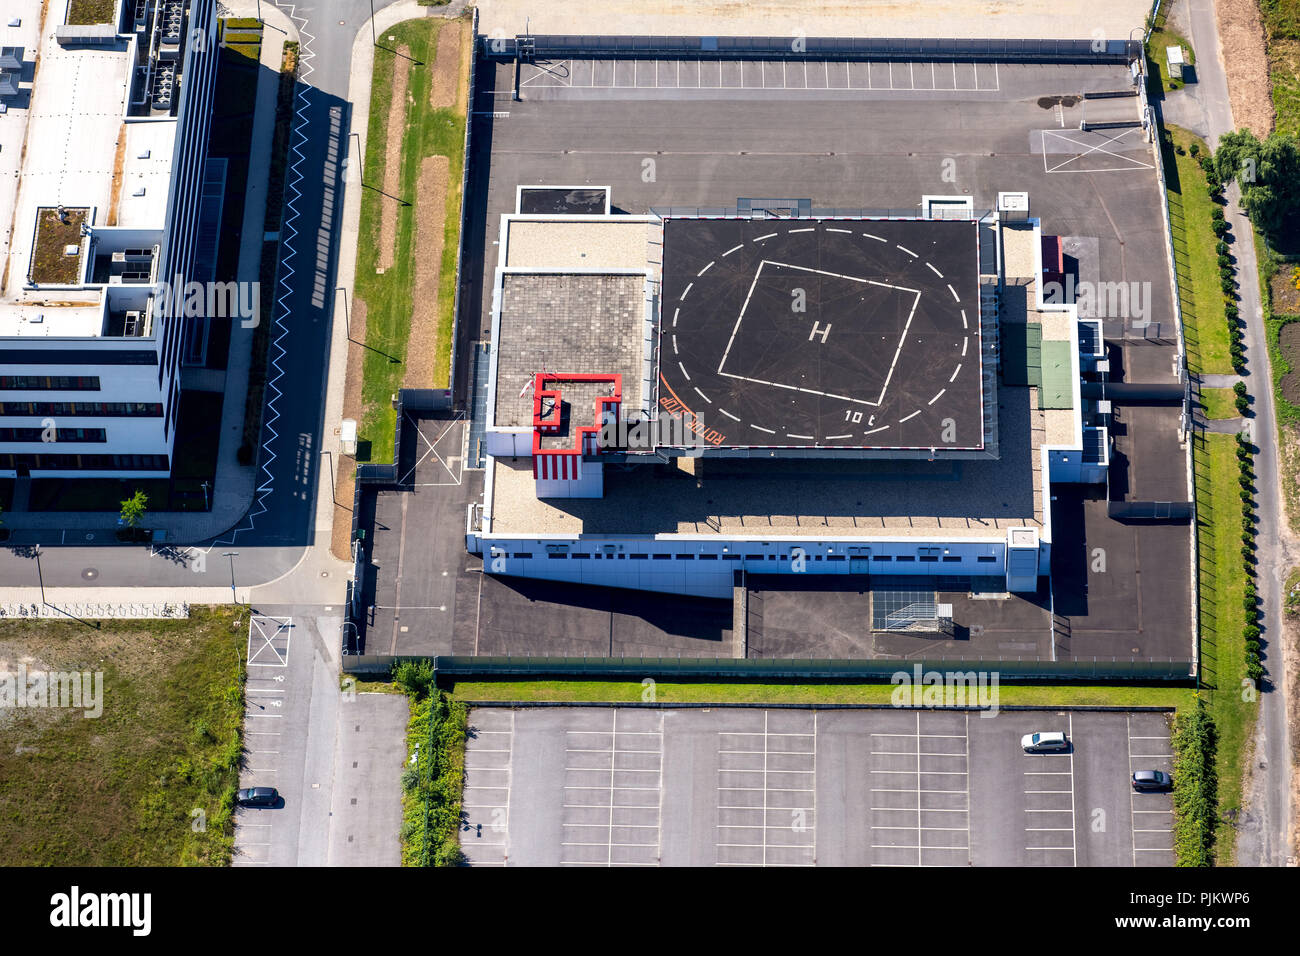 Land Office of Criminal Investigation North Rhine-Westphalia with helicopter landing pad, Dusseldorf, Rhineland, North Rhine-Westphalia, Germany - Stock Image